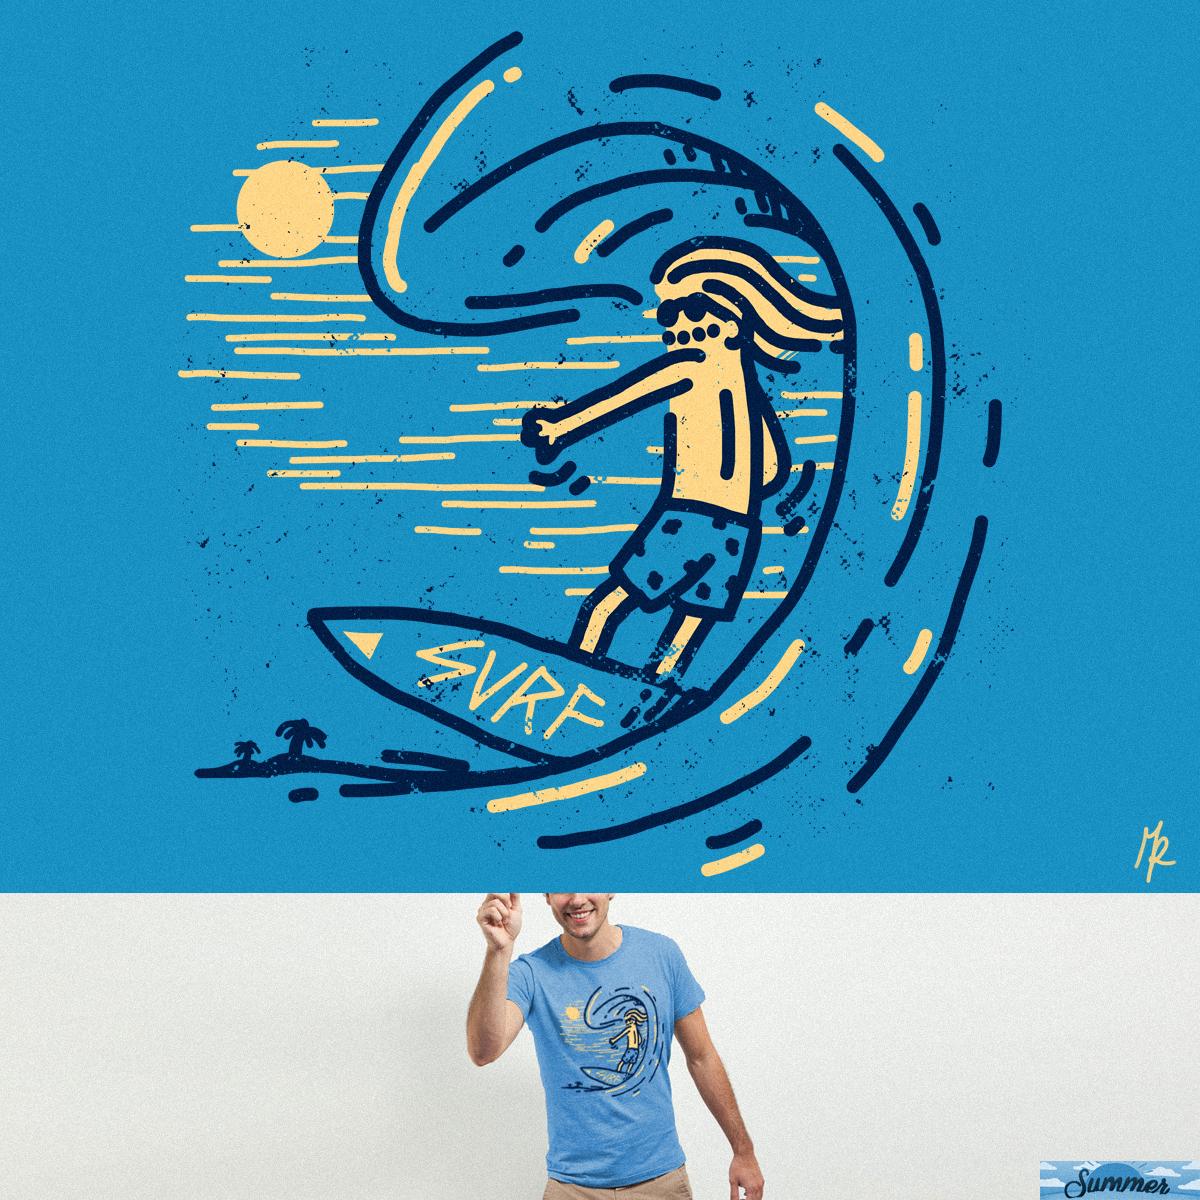 Surfin' guy by micheleficeli on Threadless